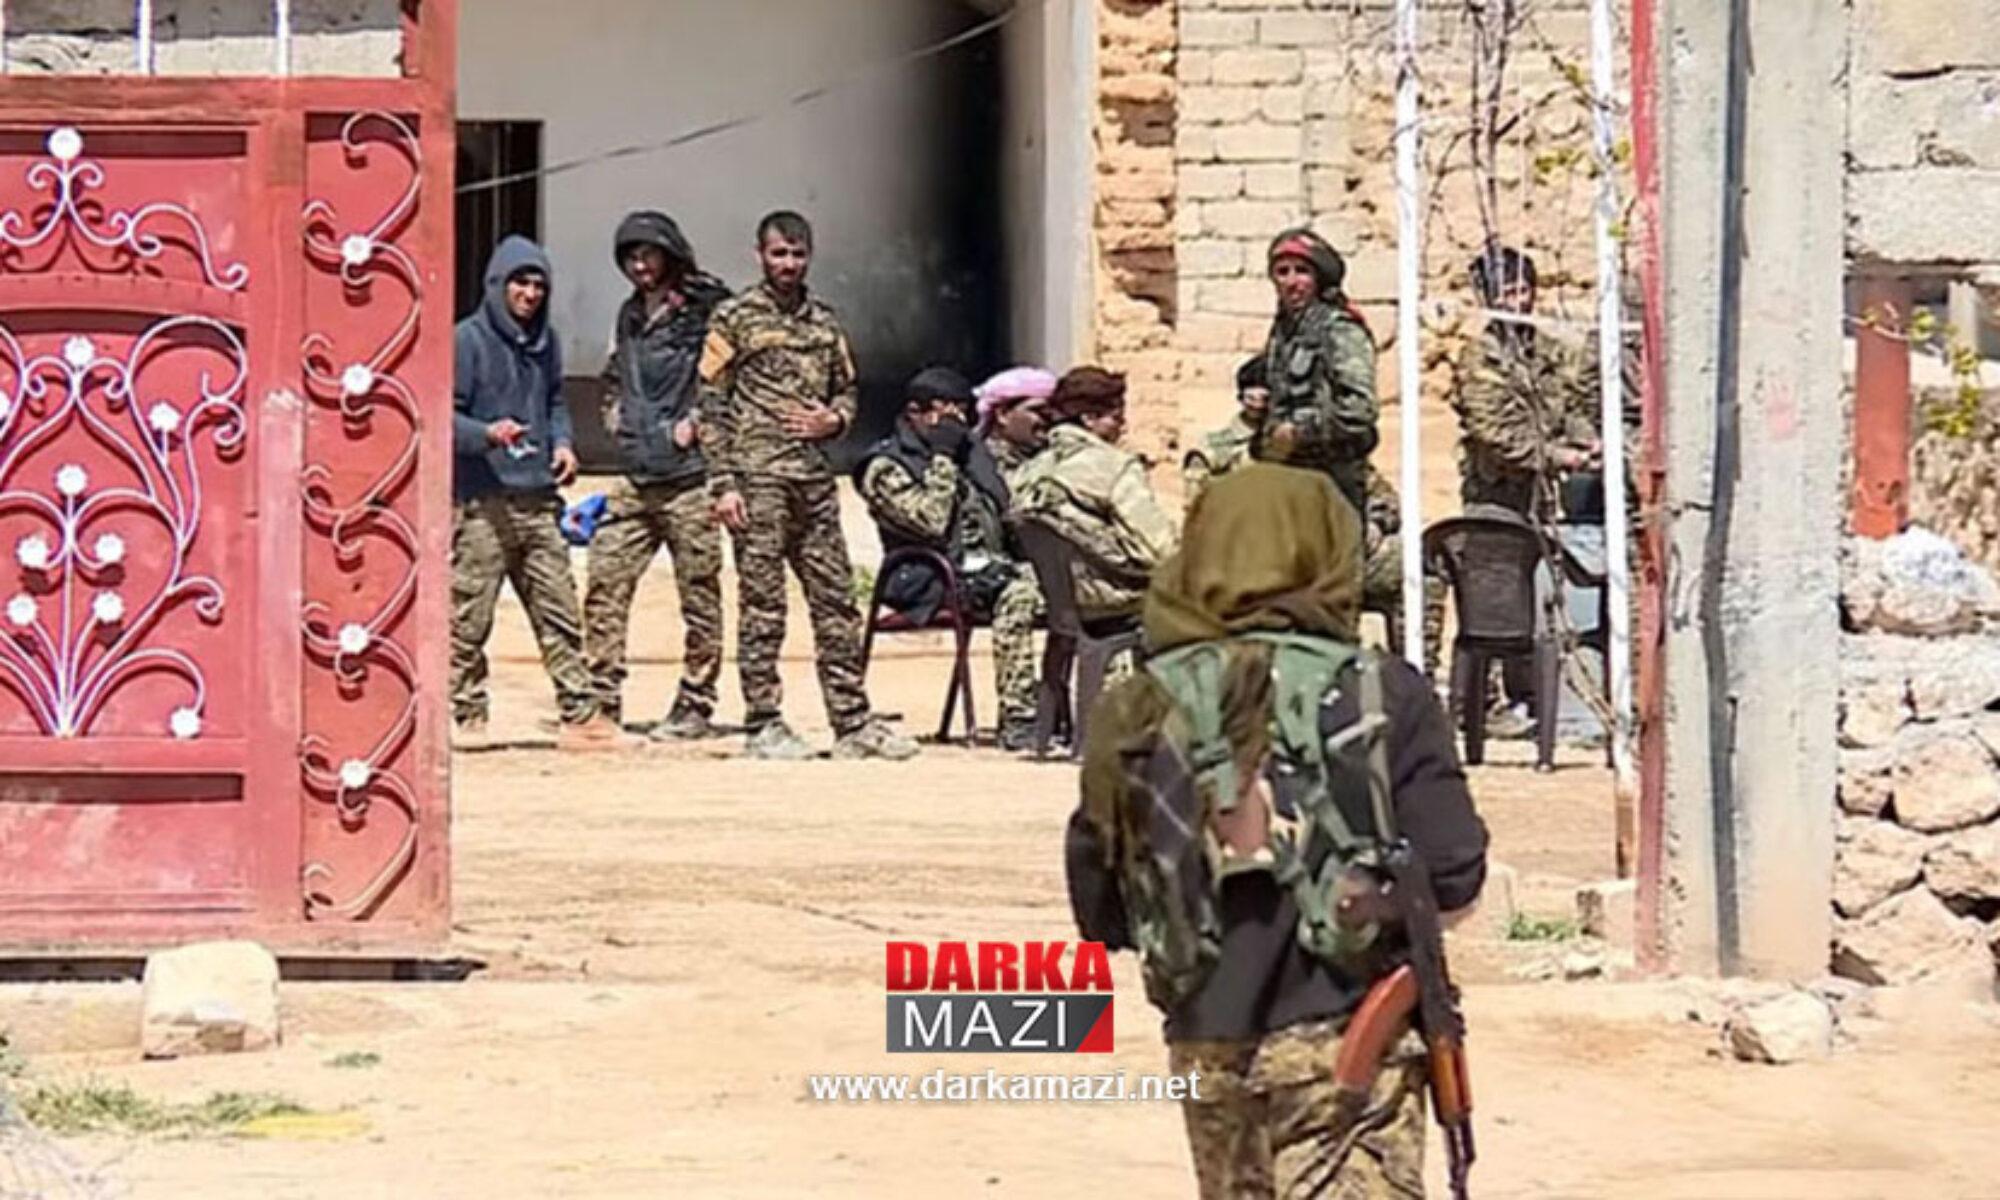 Qadir Qaçax: PKK'nin el koyduğu Şengalli çocukların sayısı IŞİD'in kaçırdığından daha